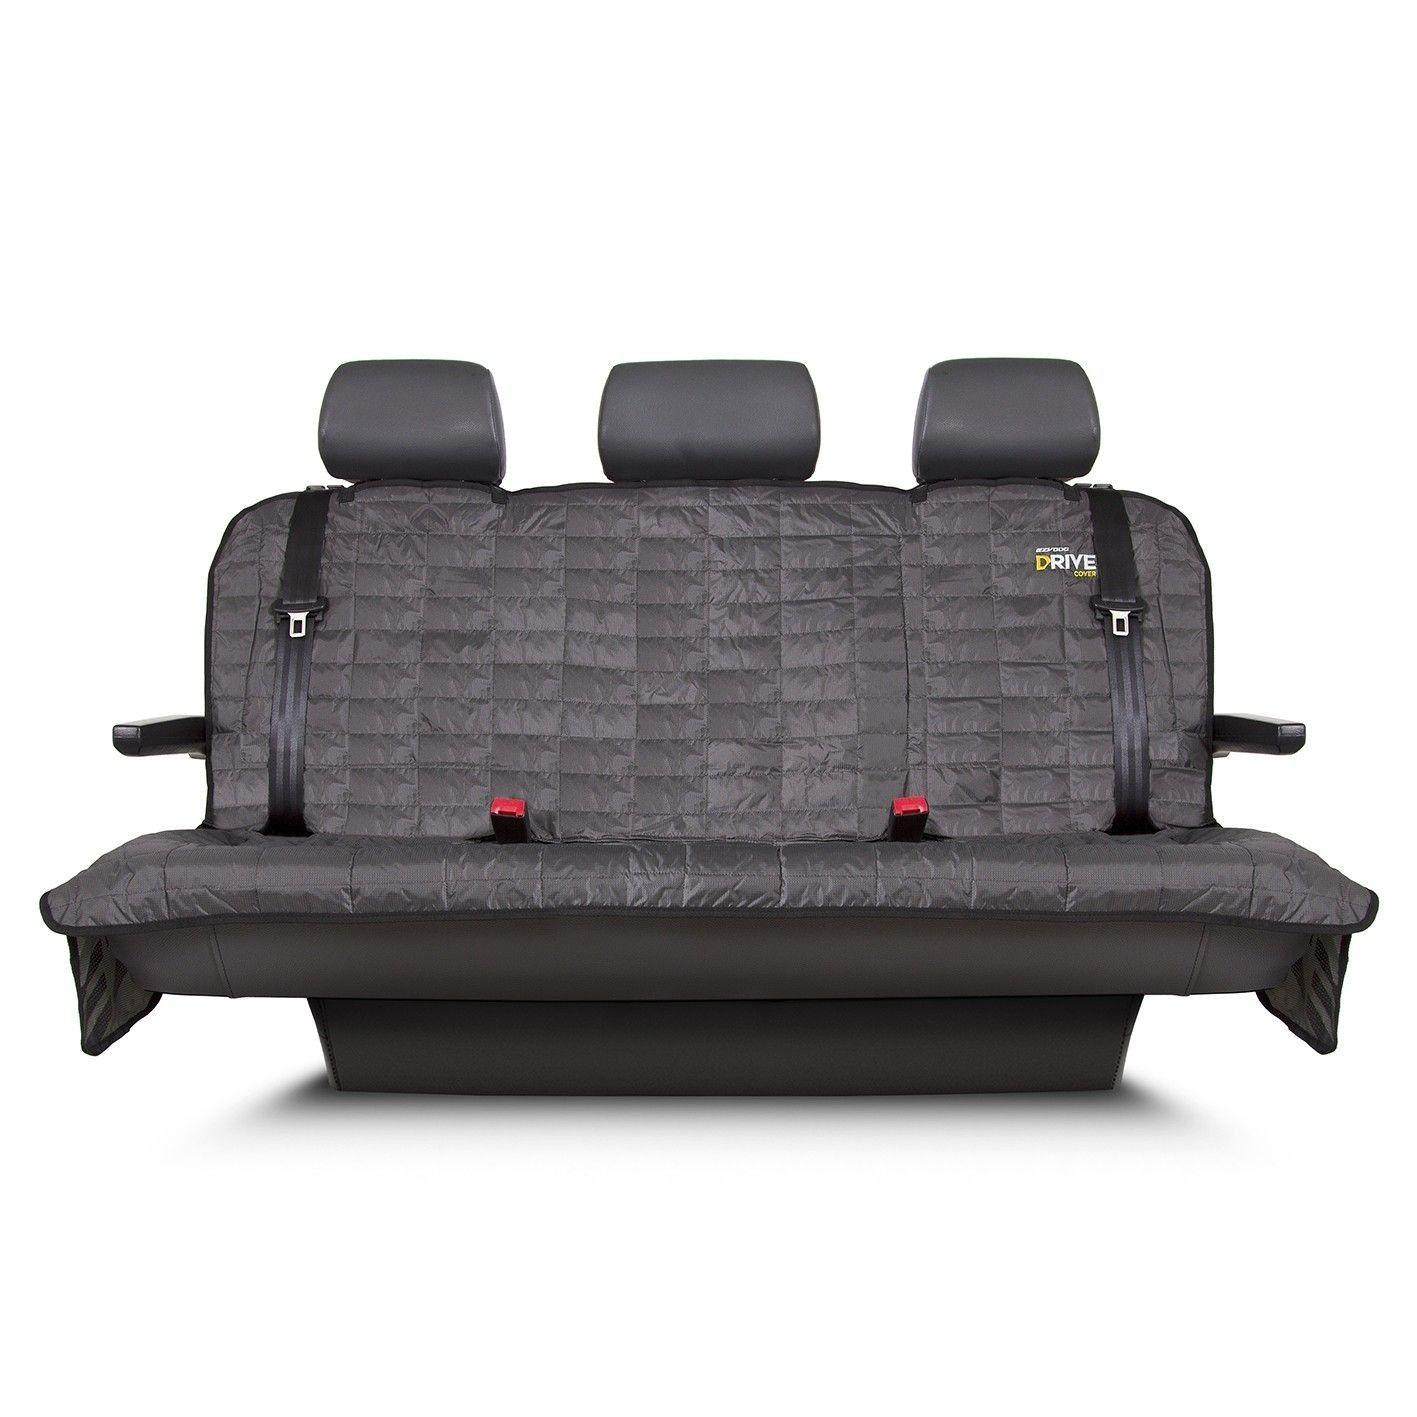 EzyDog Seat Cover